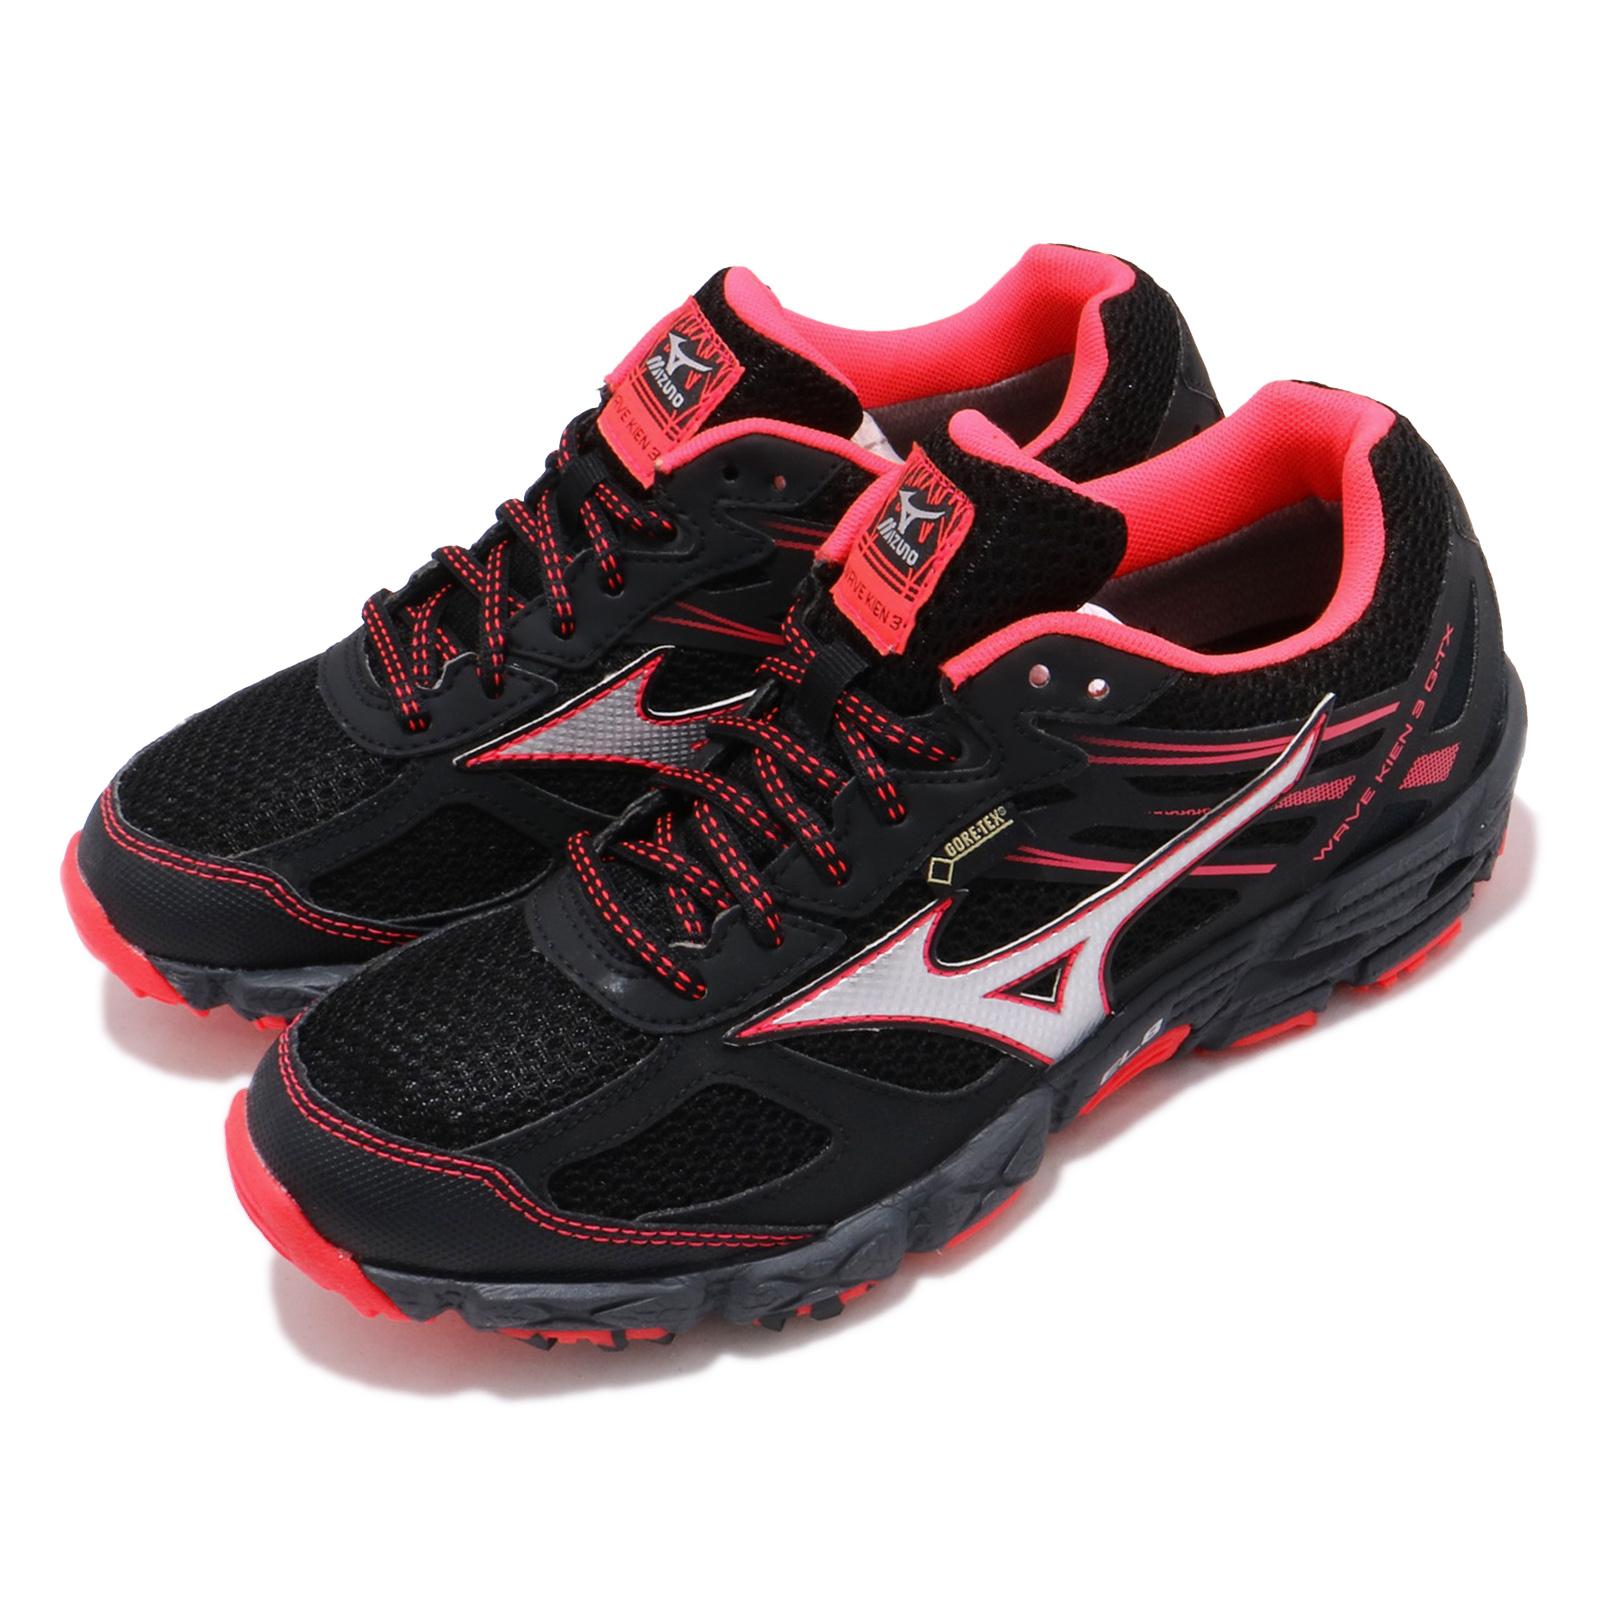 Mizuno 慢跑鞋 Wave Kien 3 GTX 女鞋 J1GK1659-03